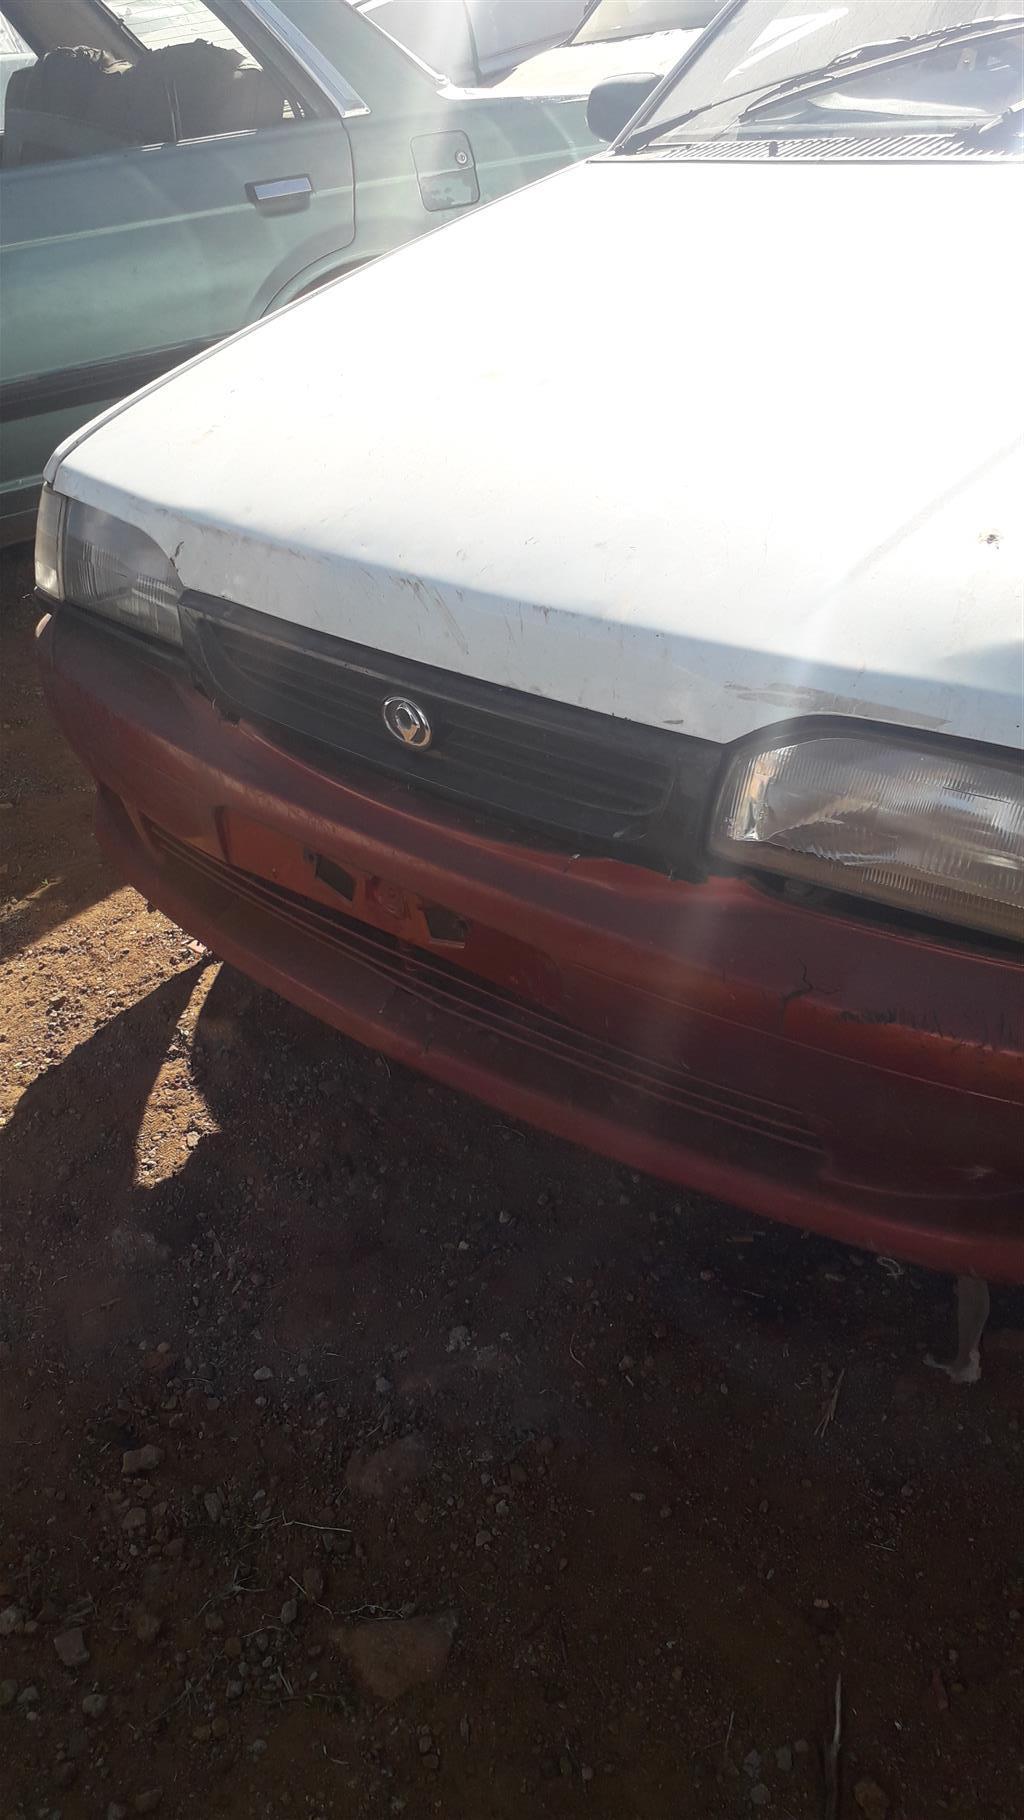 Mazda 323 for stripping engine R5000 gearbox R2500 etc